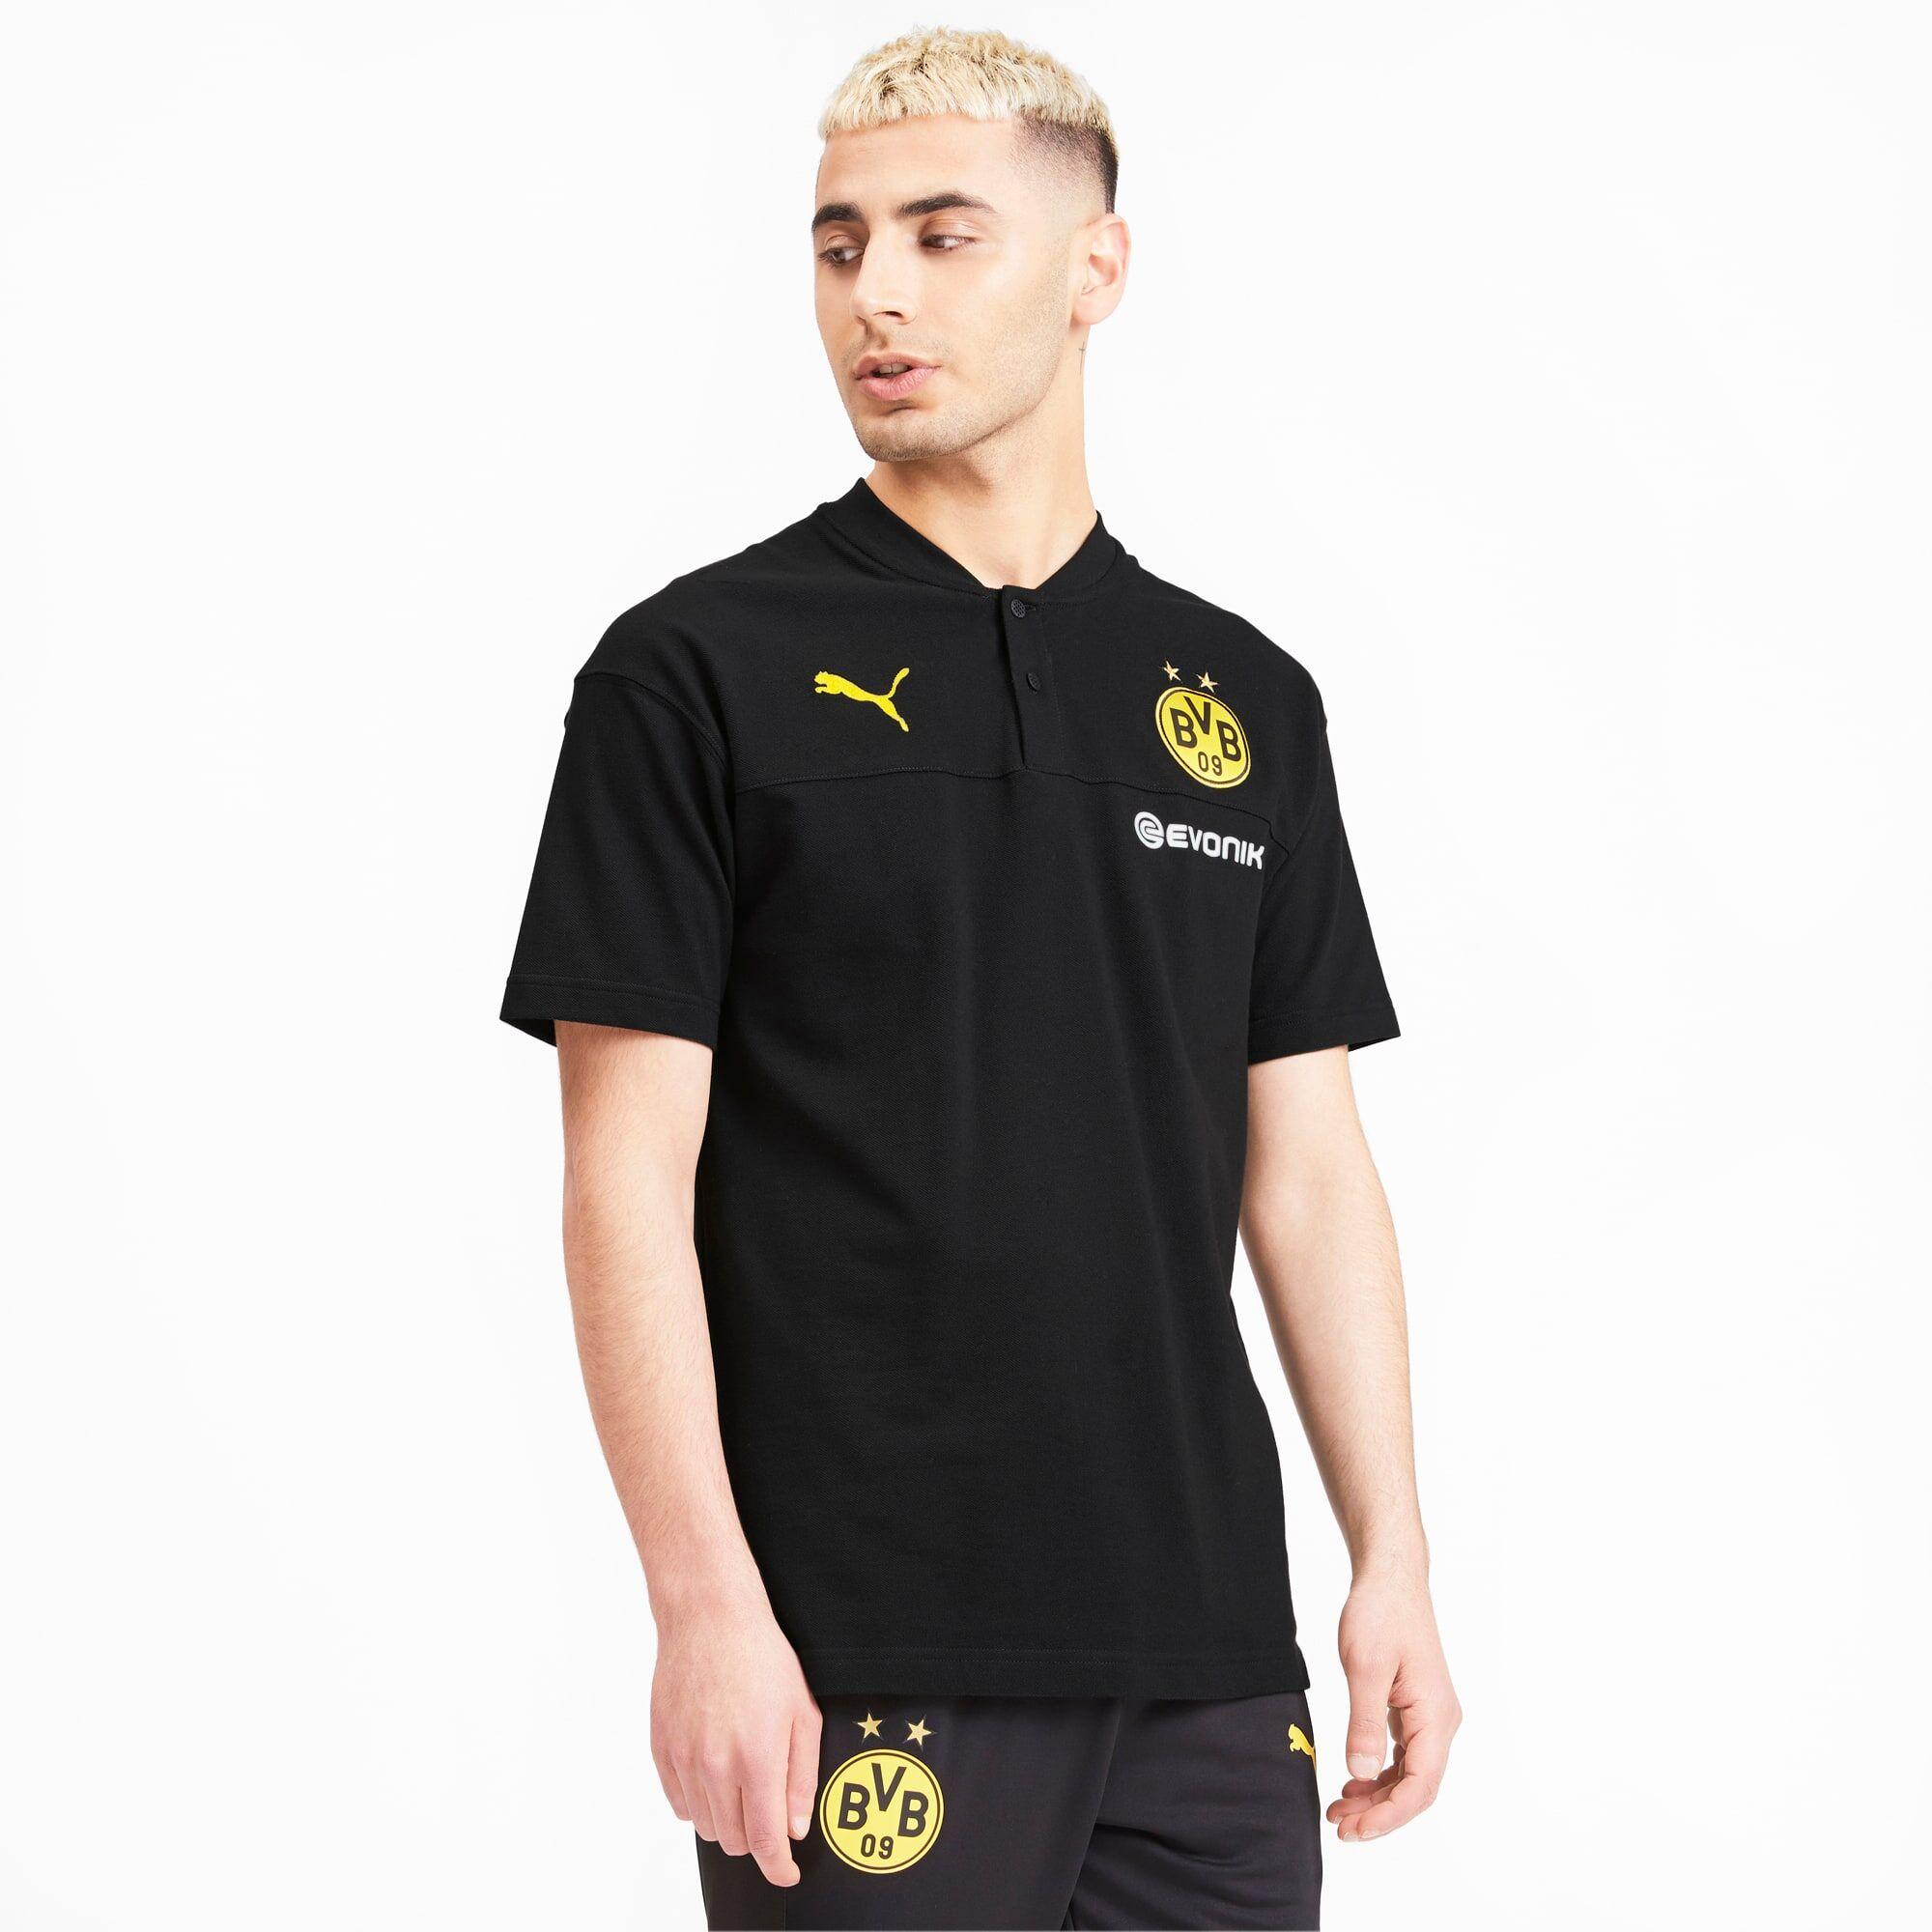 Puma BVB Casuals Men's Polo Shirt,  Black/Phantom Black, size 2X Large, Clothing